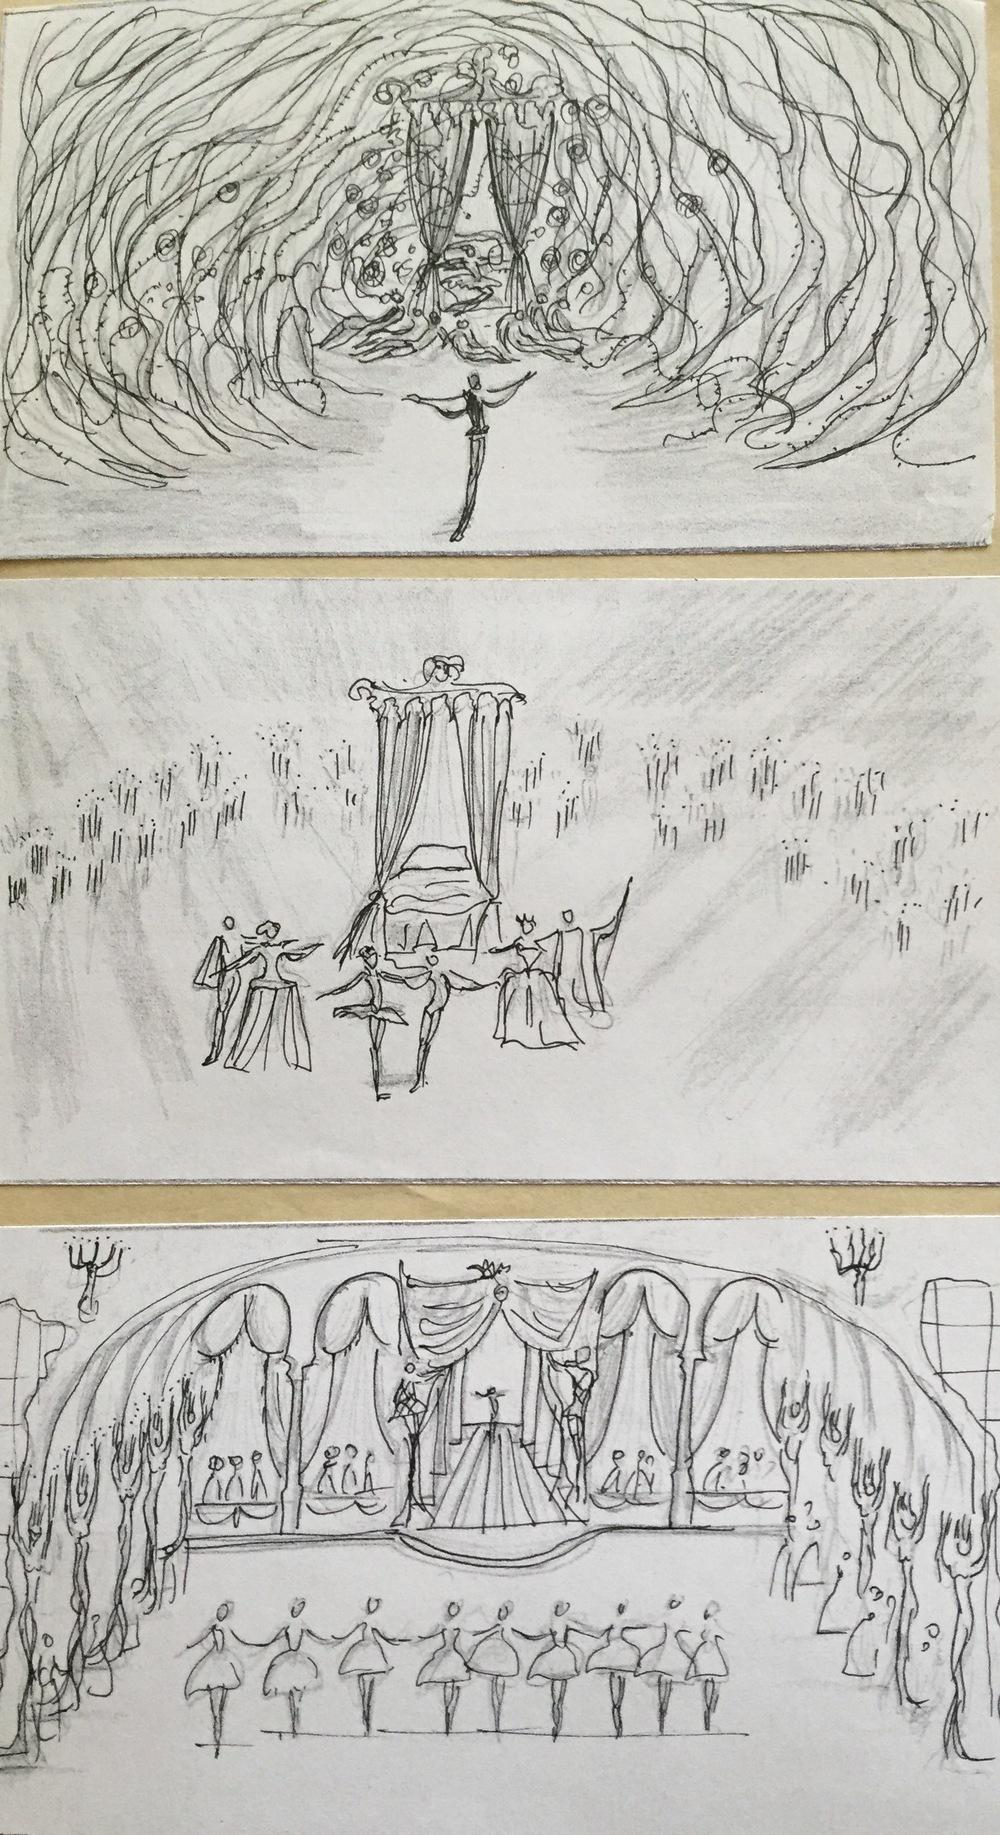 Sleeping Beauty ballet - producction design - David Roger 10.jpg